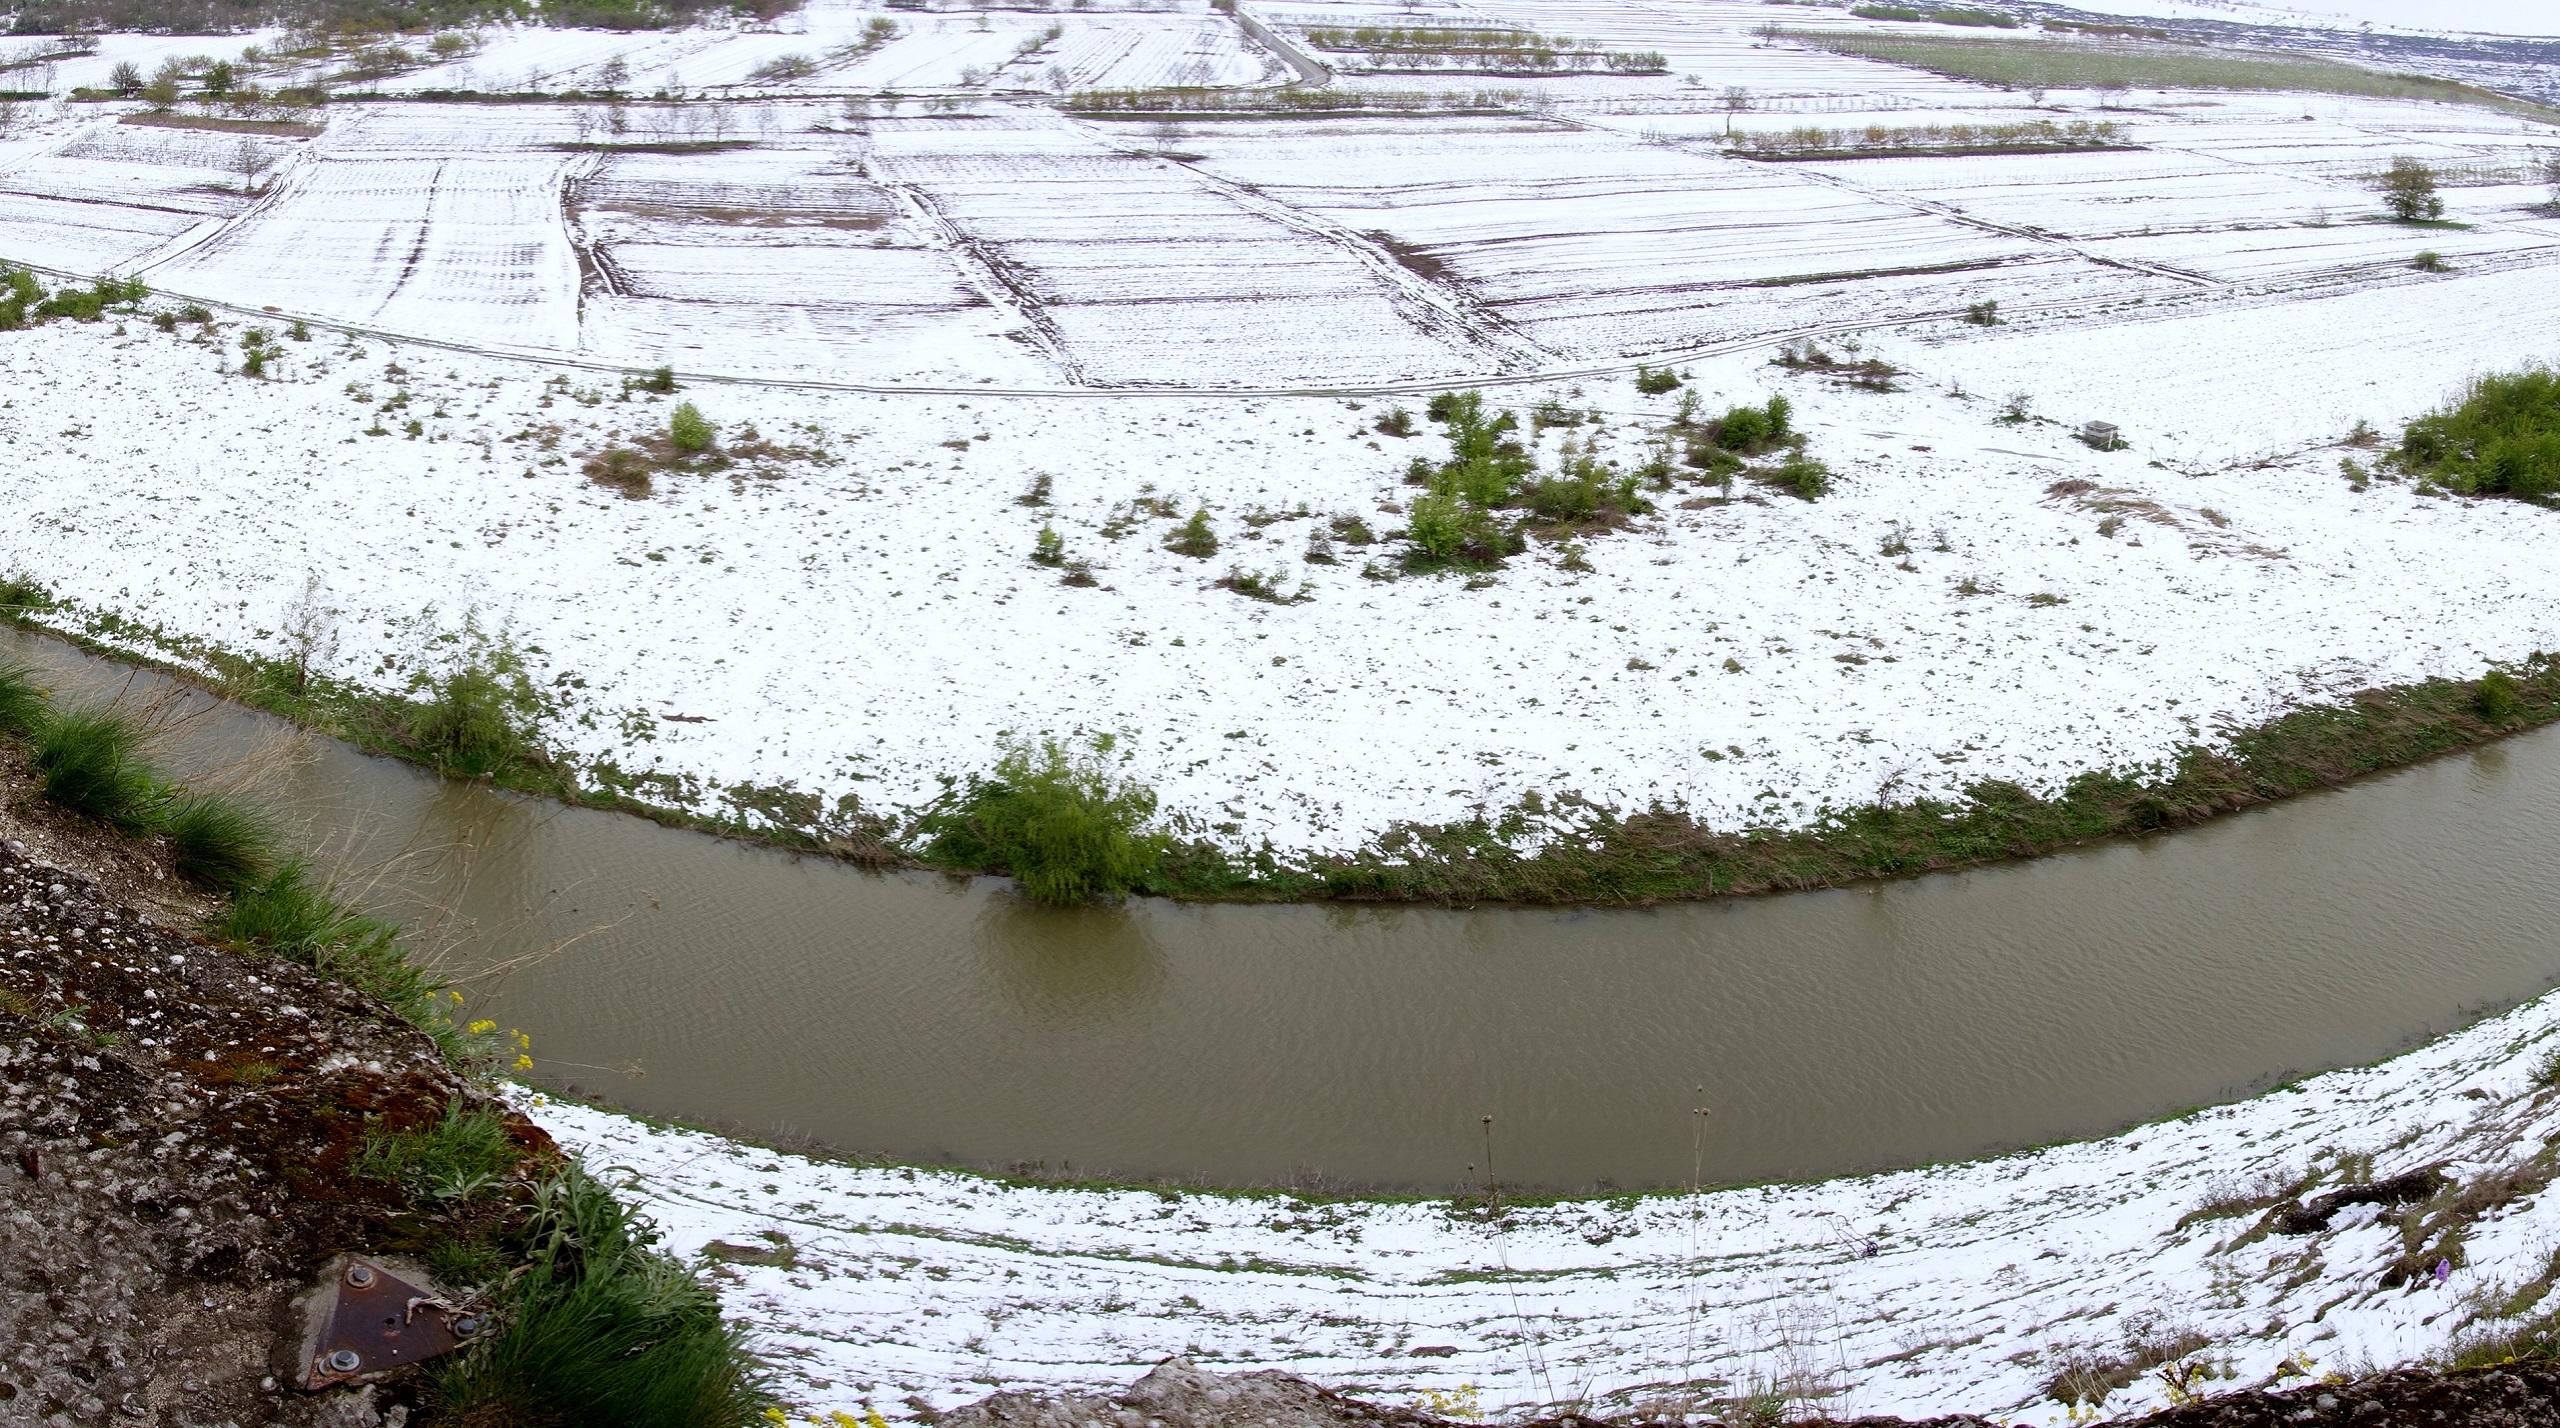 Widok na rzekę z półki skalnej monastyru Pestera, Mołdawia